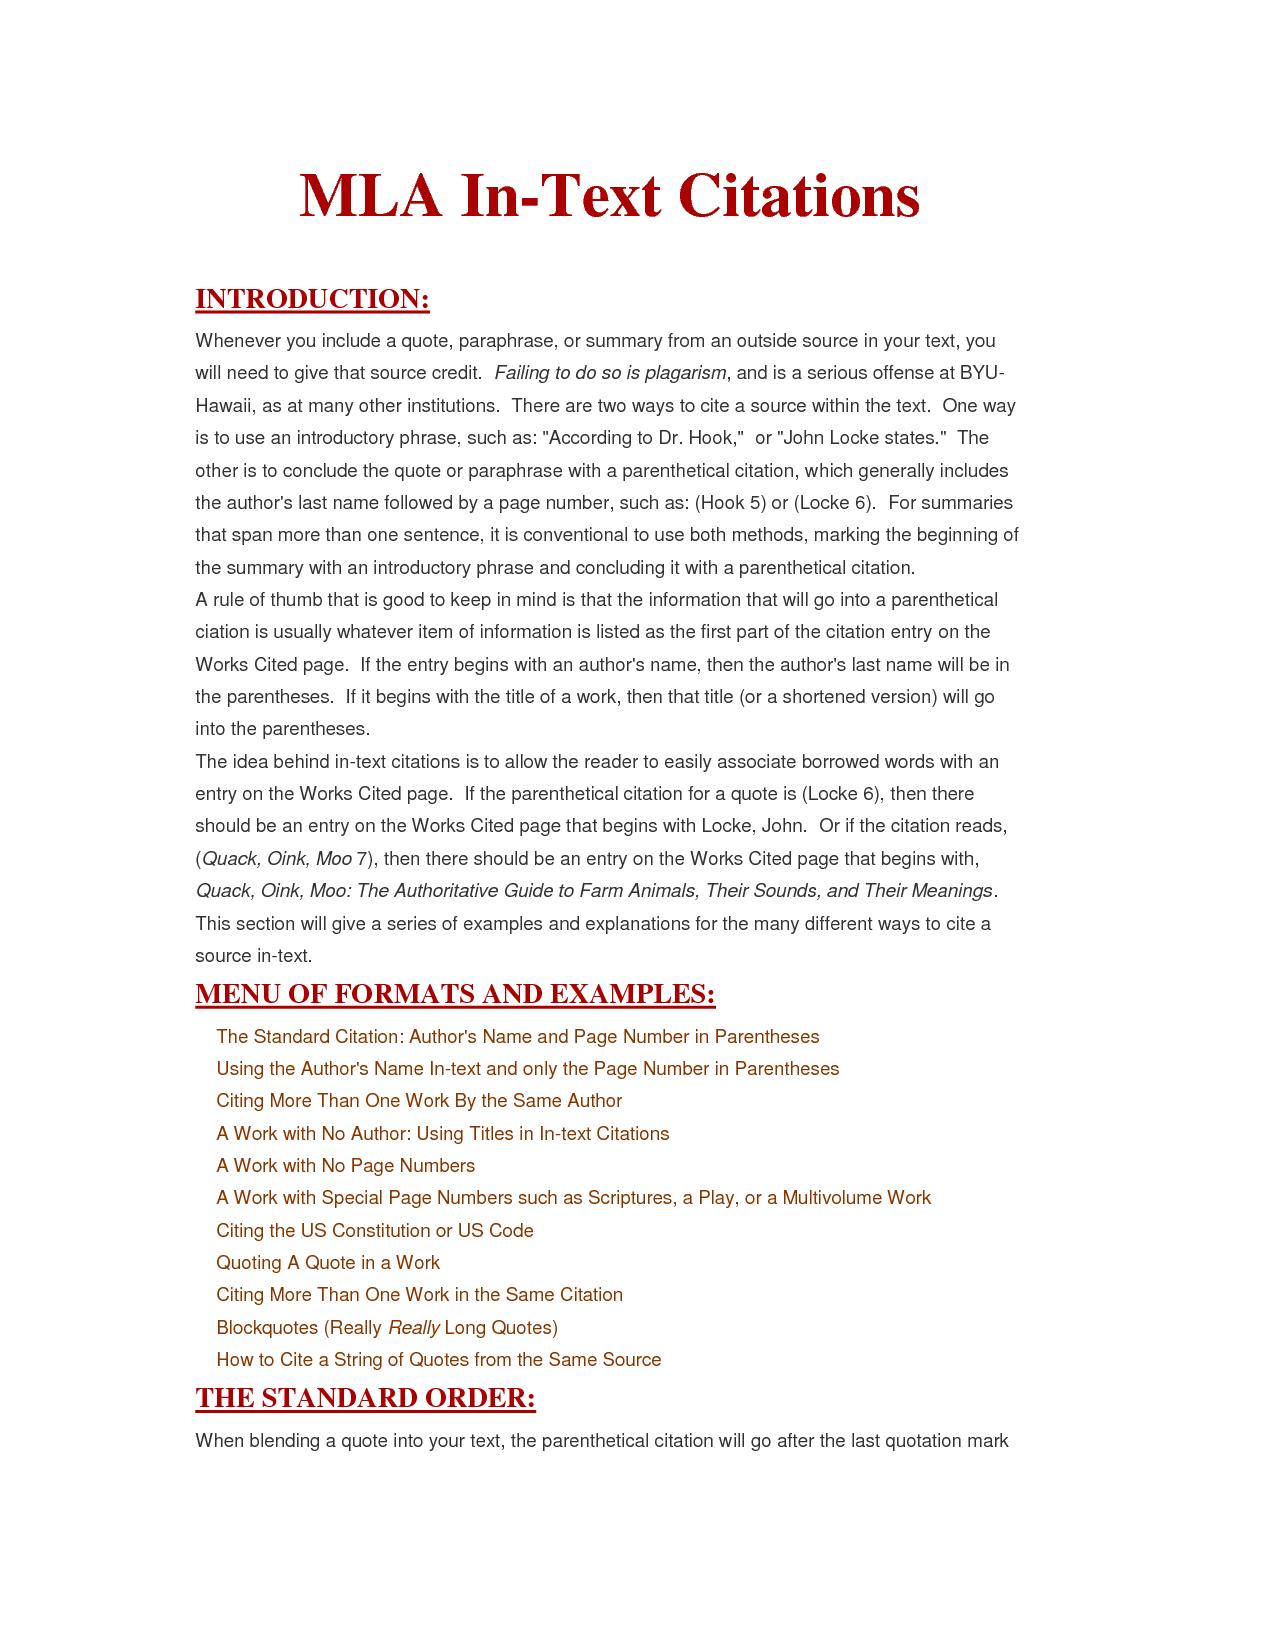 014 Mla Essay Citation Format Mersn Proforum Cos In Essays Apa Staggering Examples Citing Full